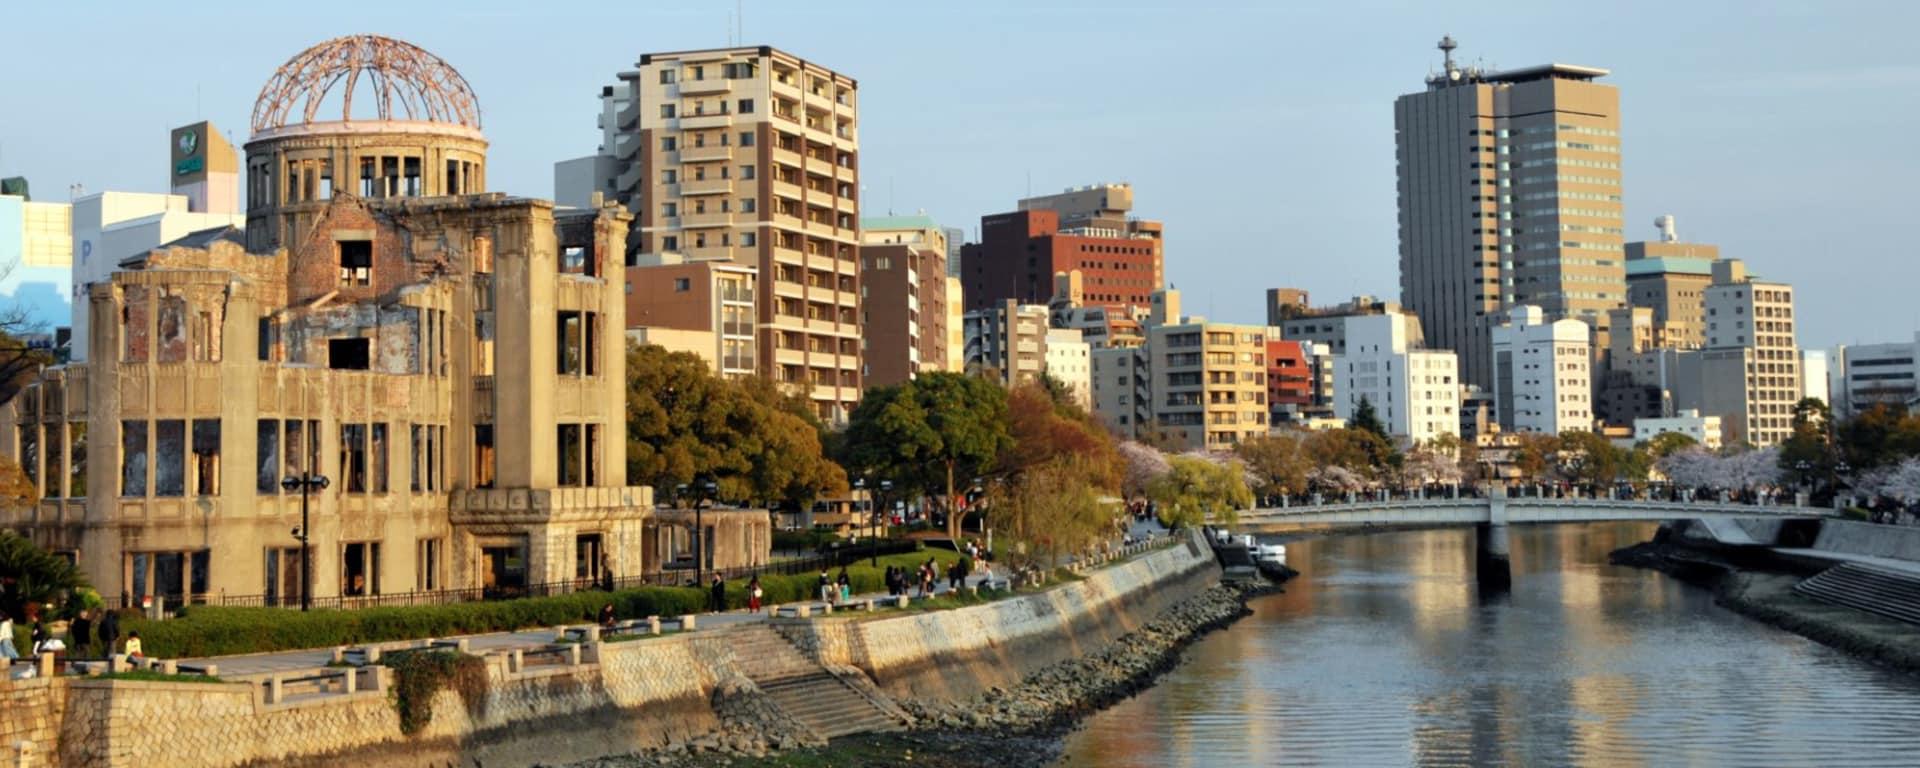 Gruppenreise «Im Reich der Sonnengöttin» ab Kyoto: Hiroshima Atomic Bomb Dome